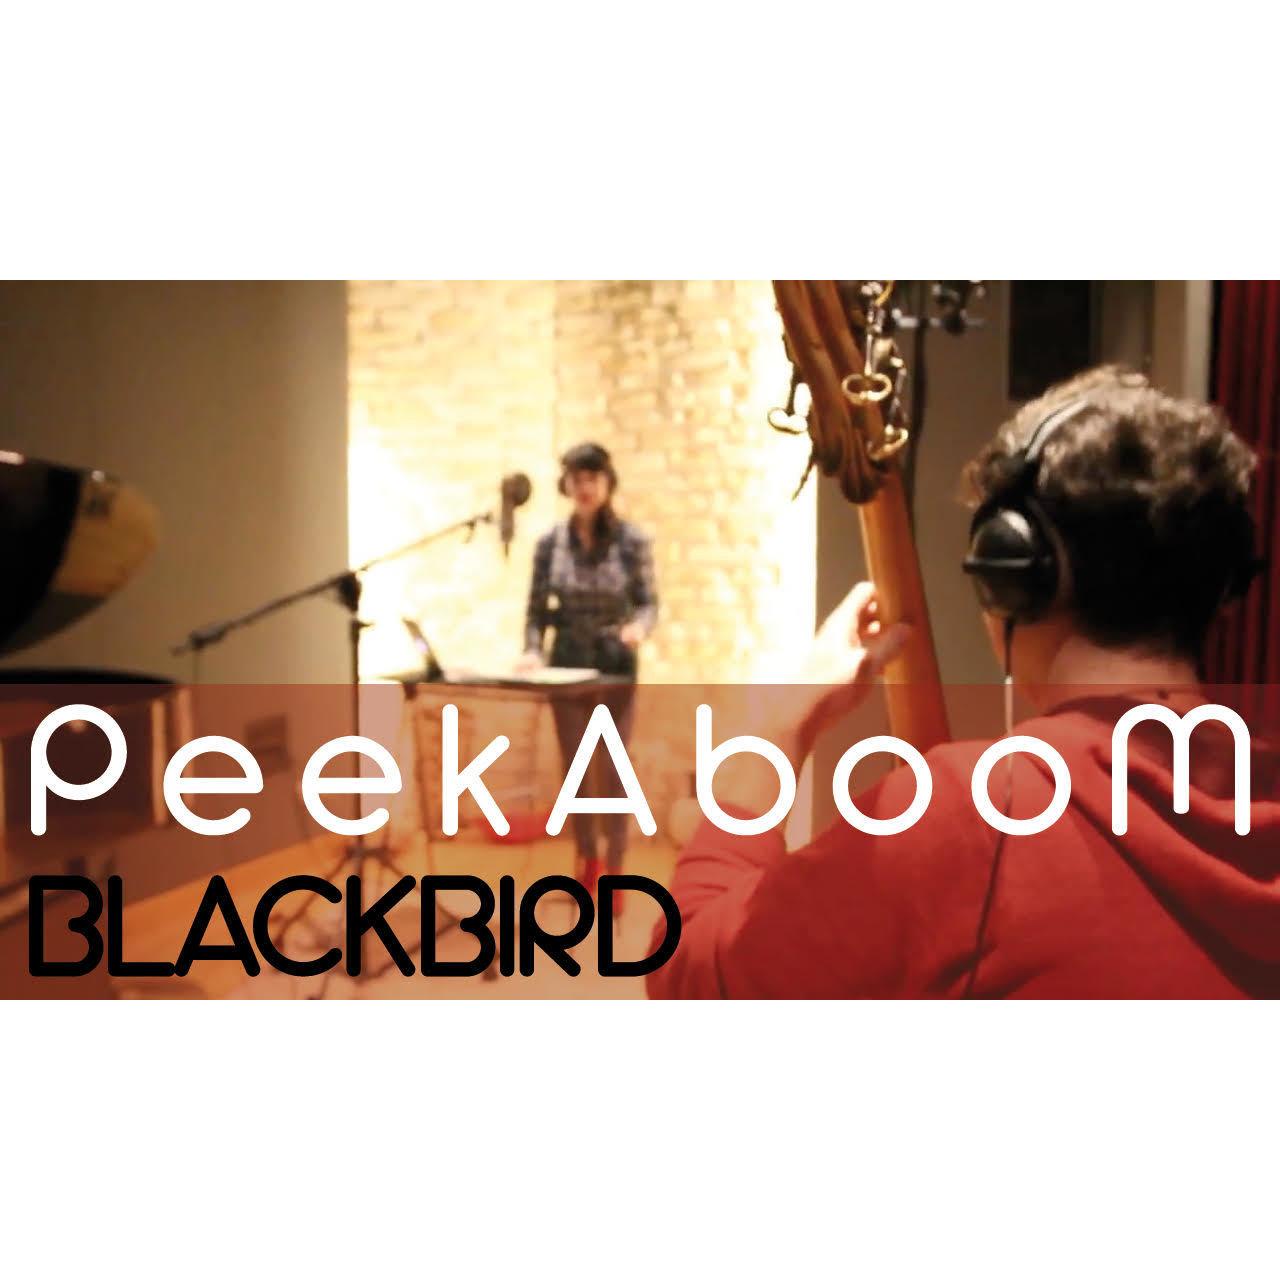 Blackbird - Peekaboom (The Beatles cover - Studio Version) - MP3 Single 00007